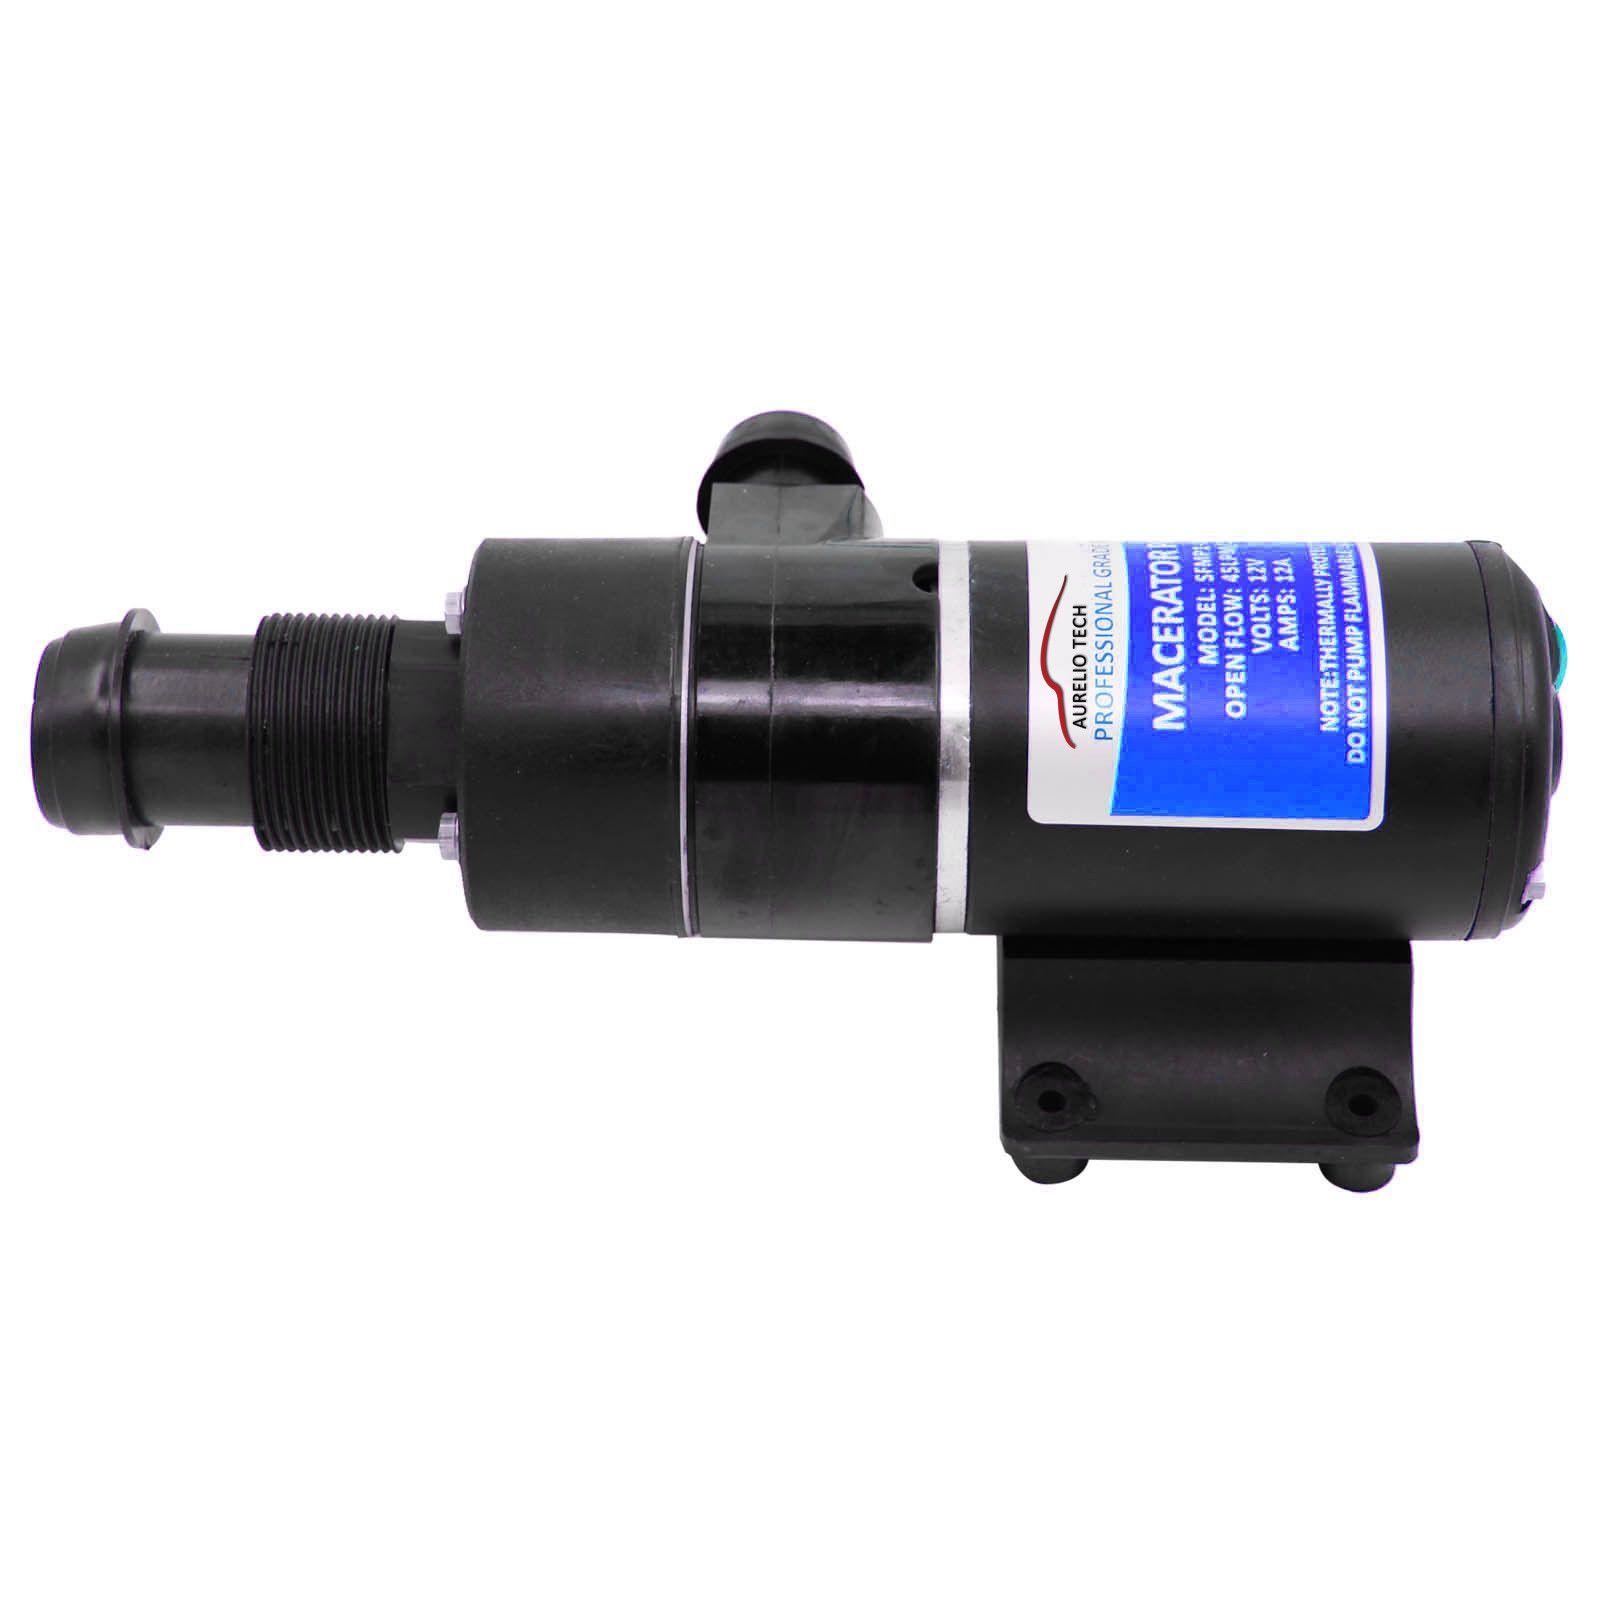 12V Macerator Water Waste Pump 45 LPM 12GPM Toilet RV